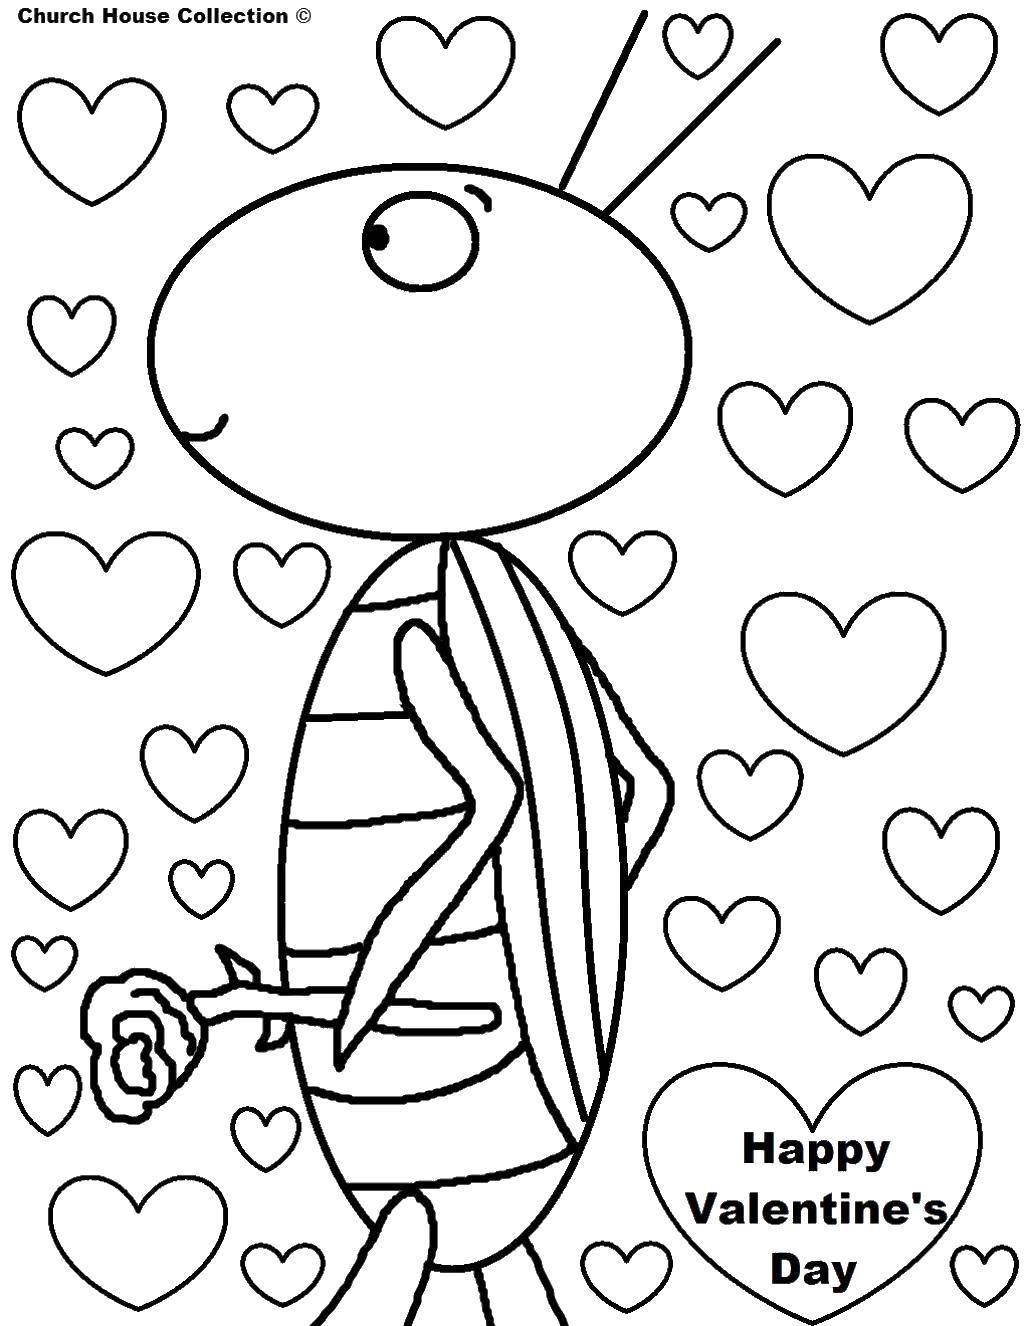 Coloring sheet St Valentins day Download ,cartoons, children,.  Print